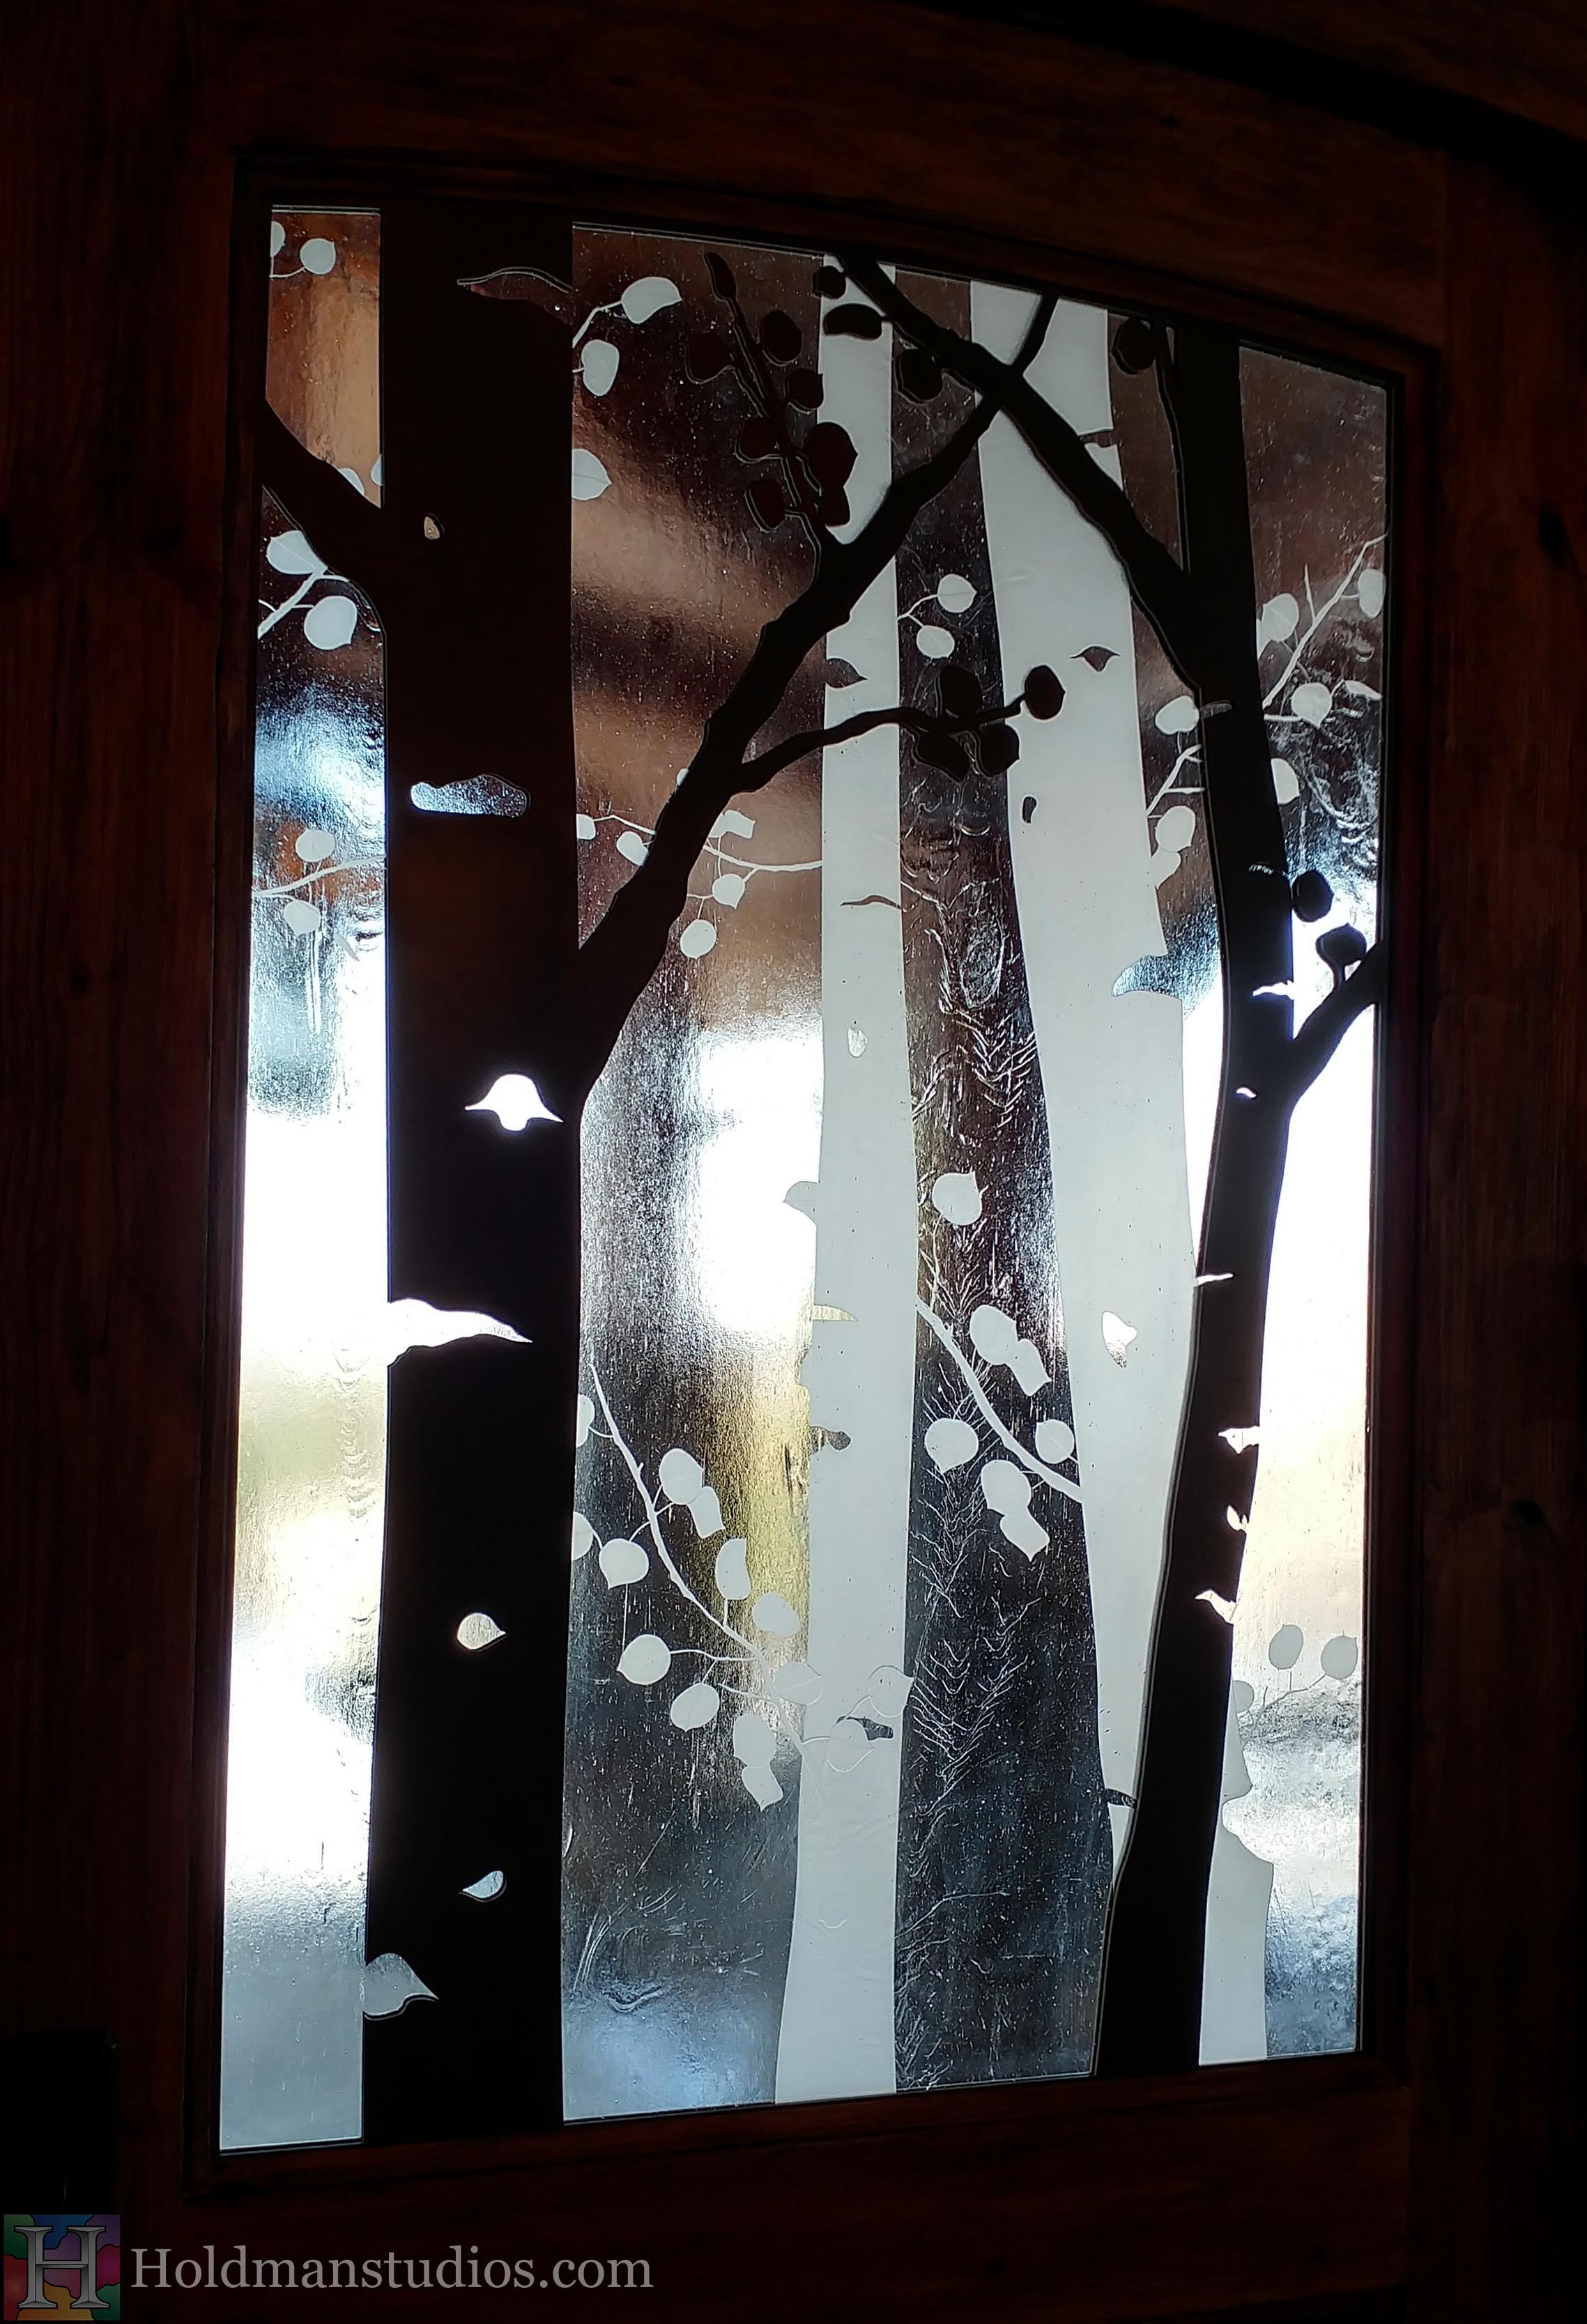 Holdman-studios-etched-art-glass-front-door-window-aspen-trees-leaves-closeup.jpg